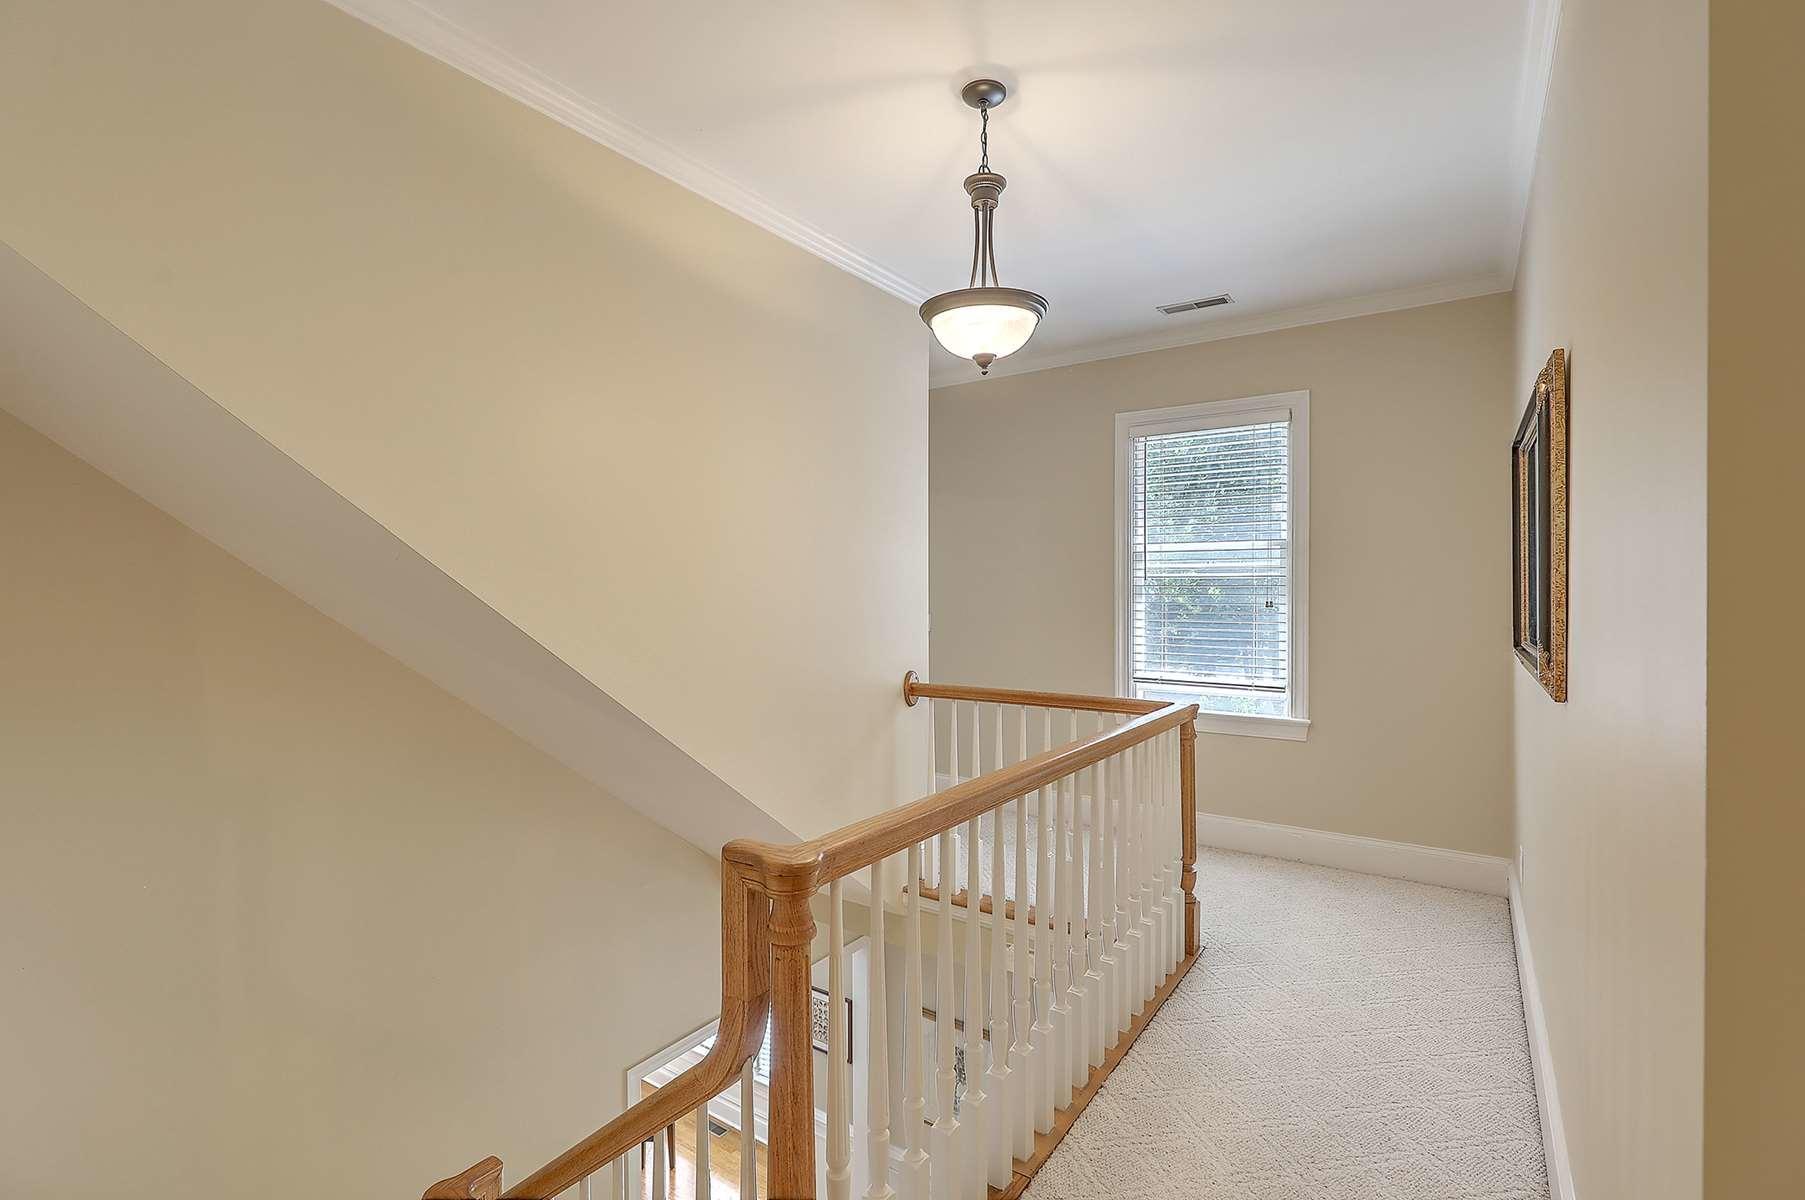 Dunes West Homes For Sale - 2961 Pignatelli, Mount Pleasant, SC - 45